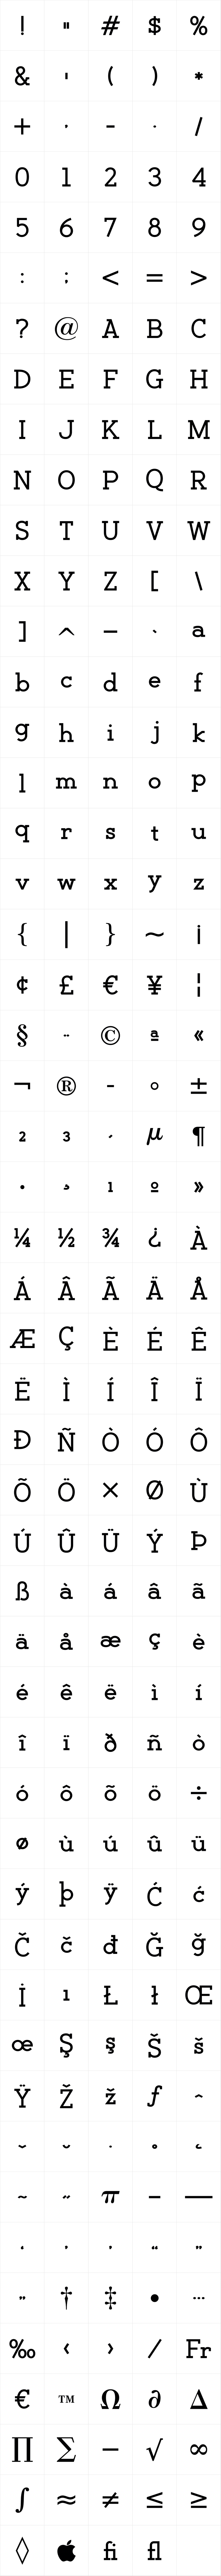 Backtalk Serif BTN Bold